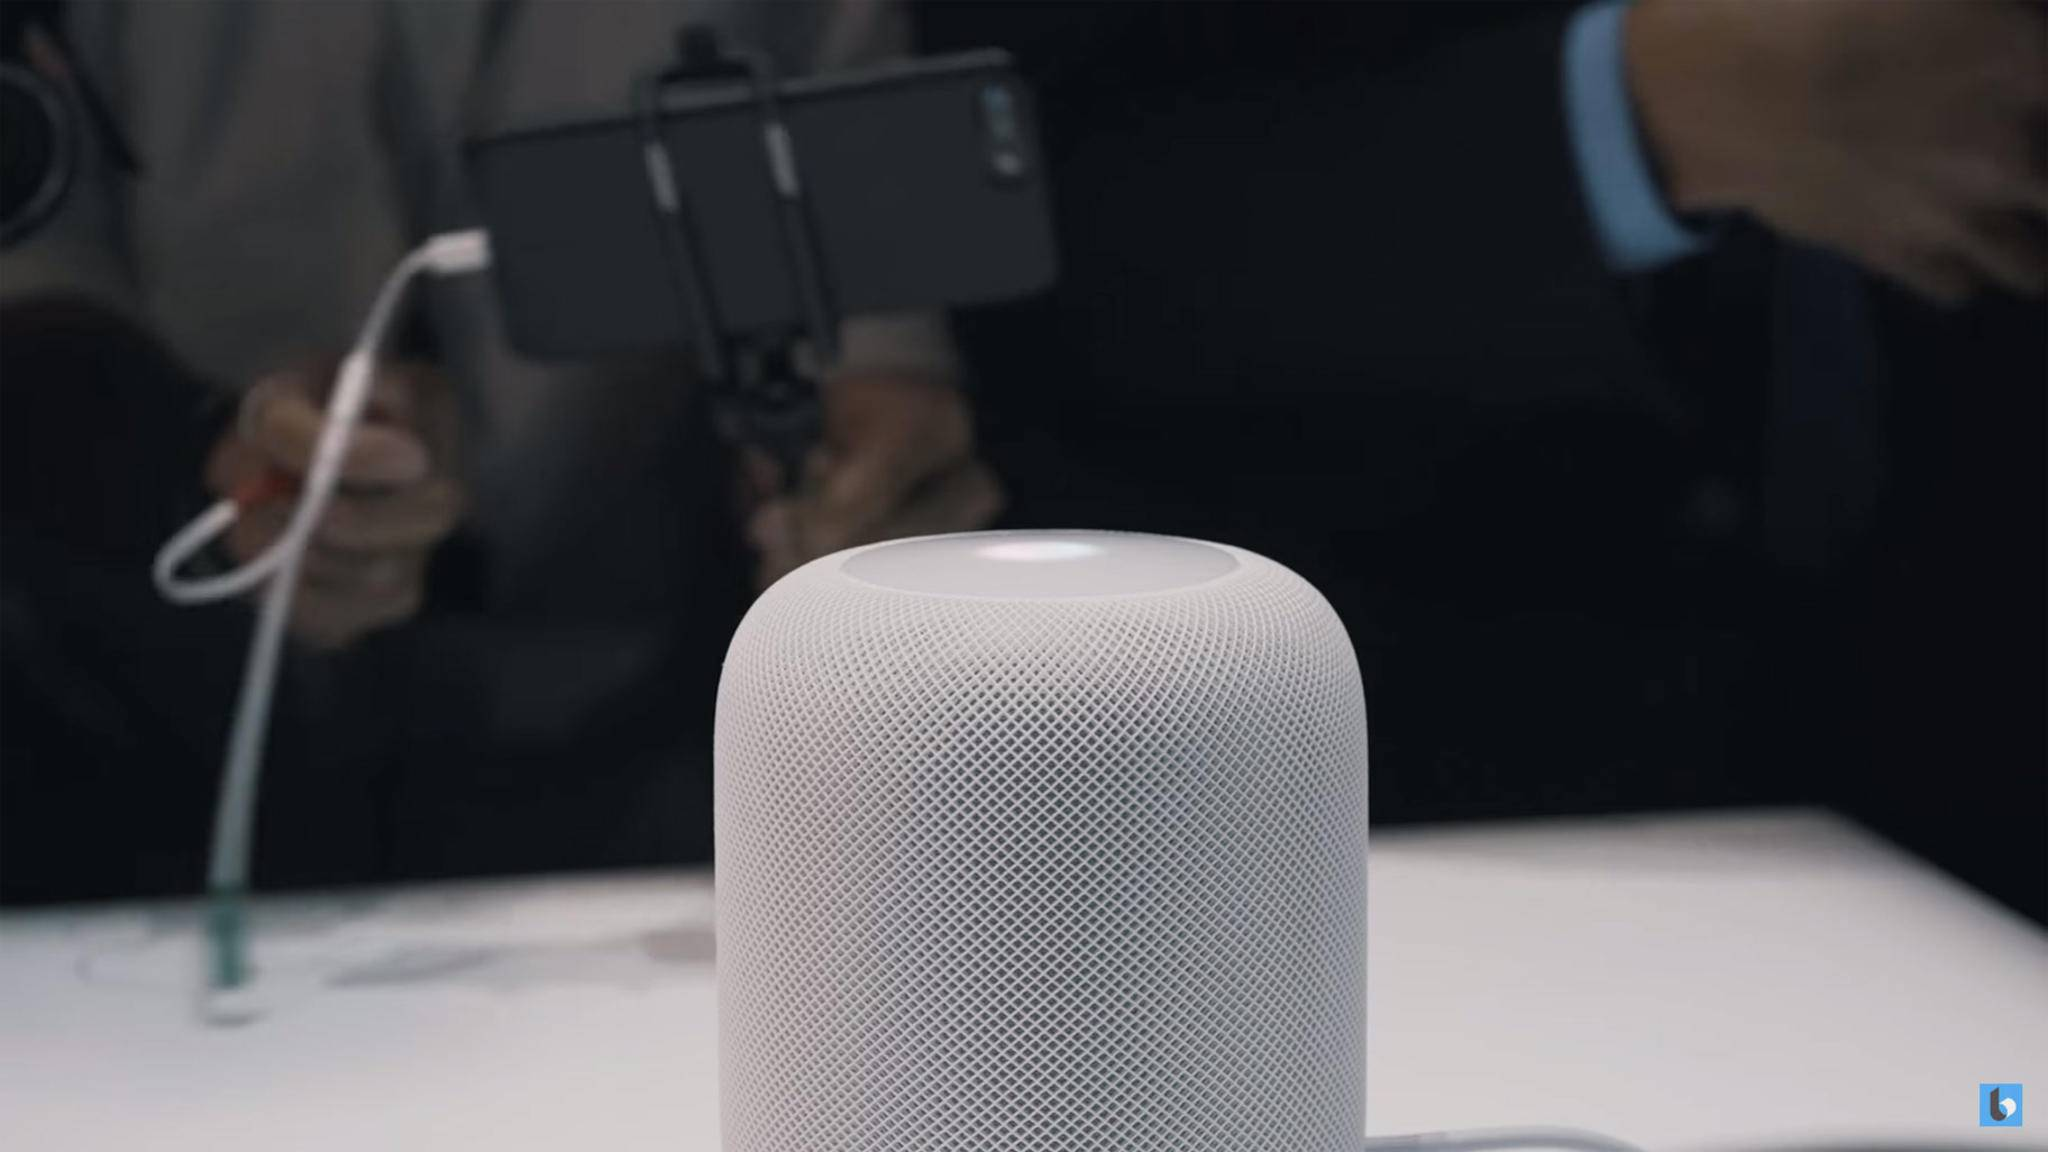 Wie die System-Sounds des Apple HomePod klingen, wurde jetzt enthüllt.